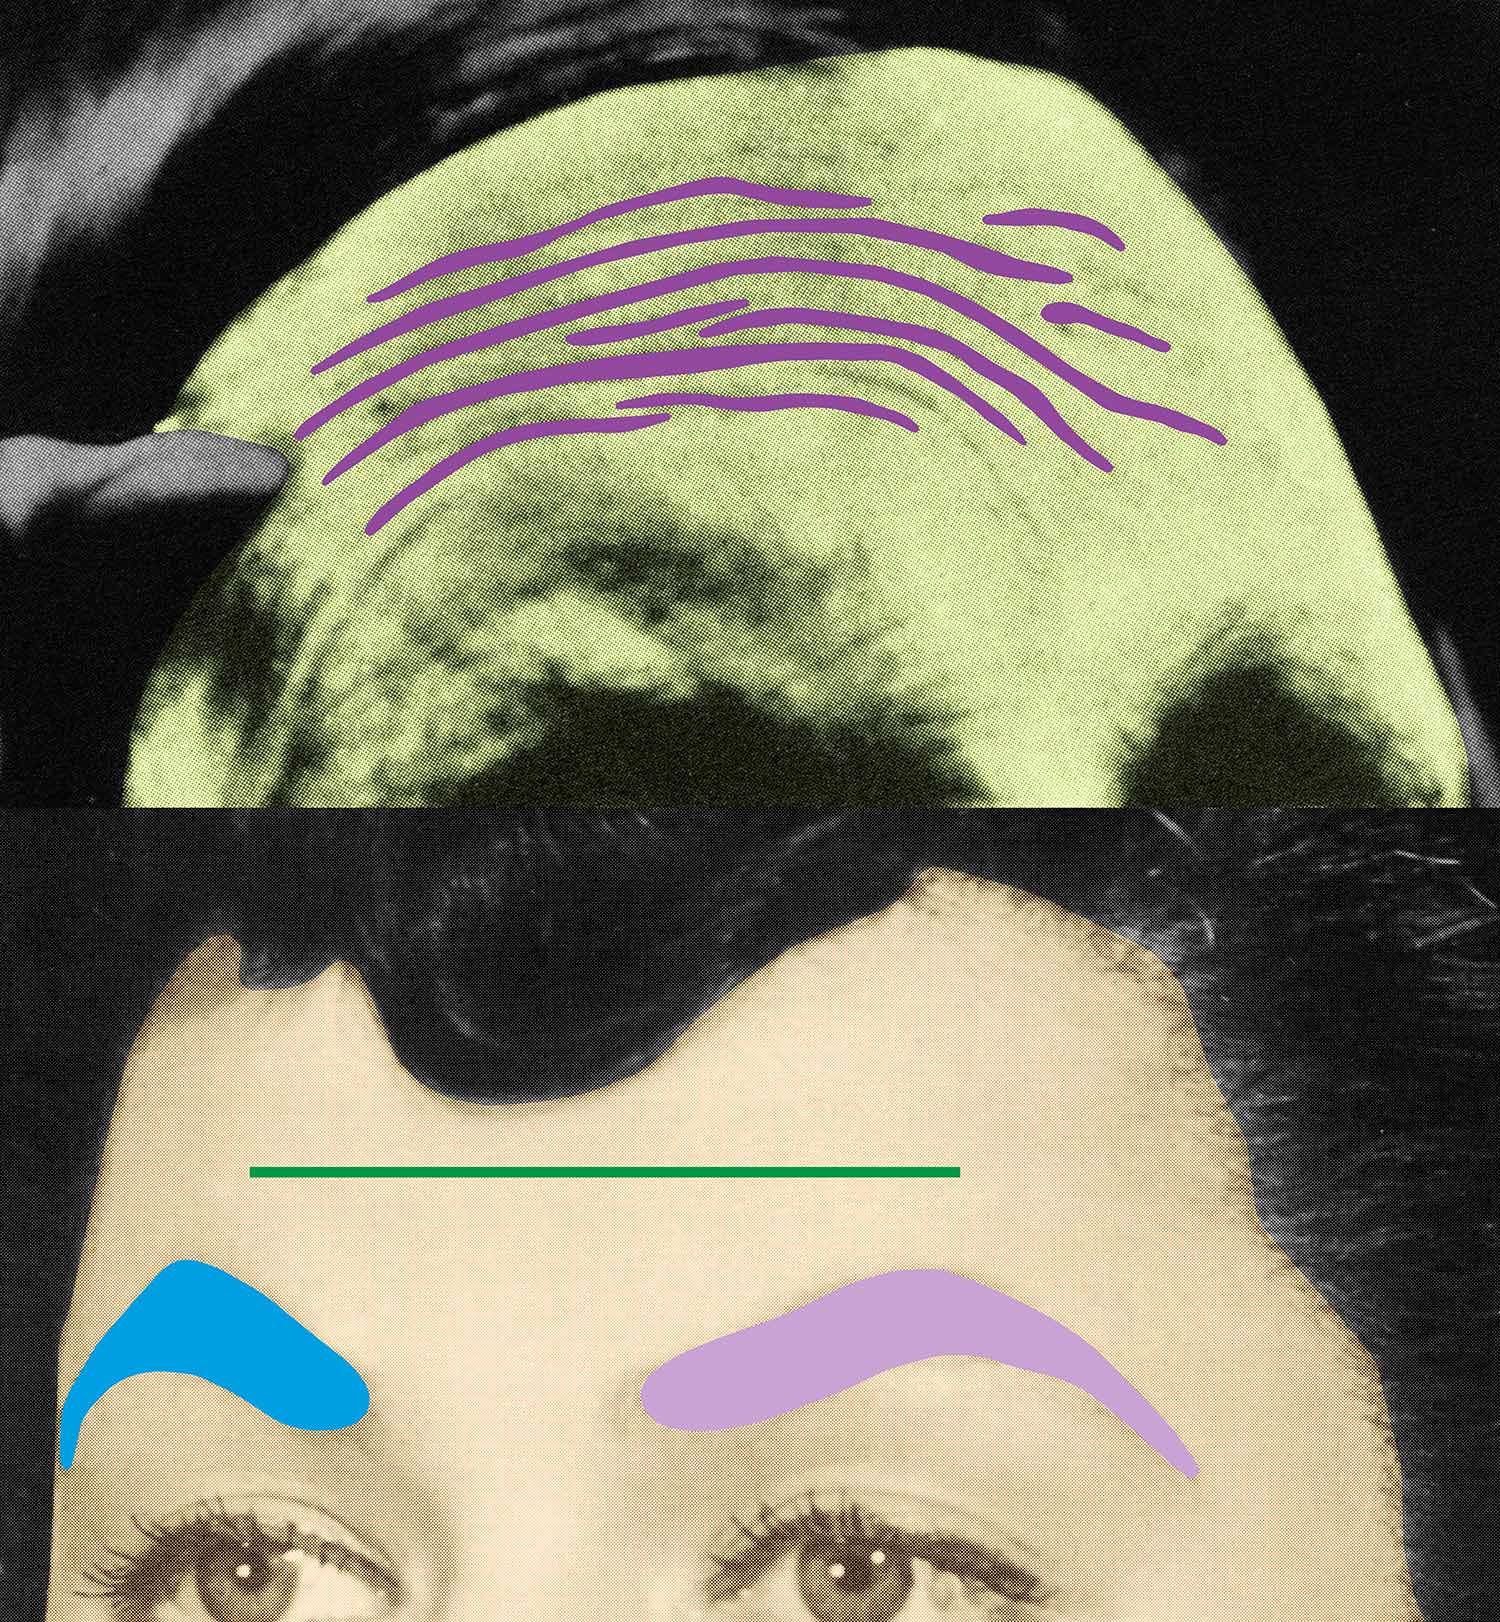 Raised Eyebrows/ Furrowed Foreheads: Two Foreheads (One Green) , 2009 Publisher: Freunde der Kunstmuseen Krefeld e.V., Edition of 30.  ©John Baldessari